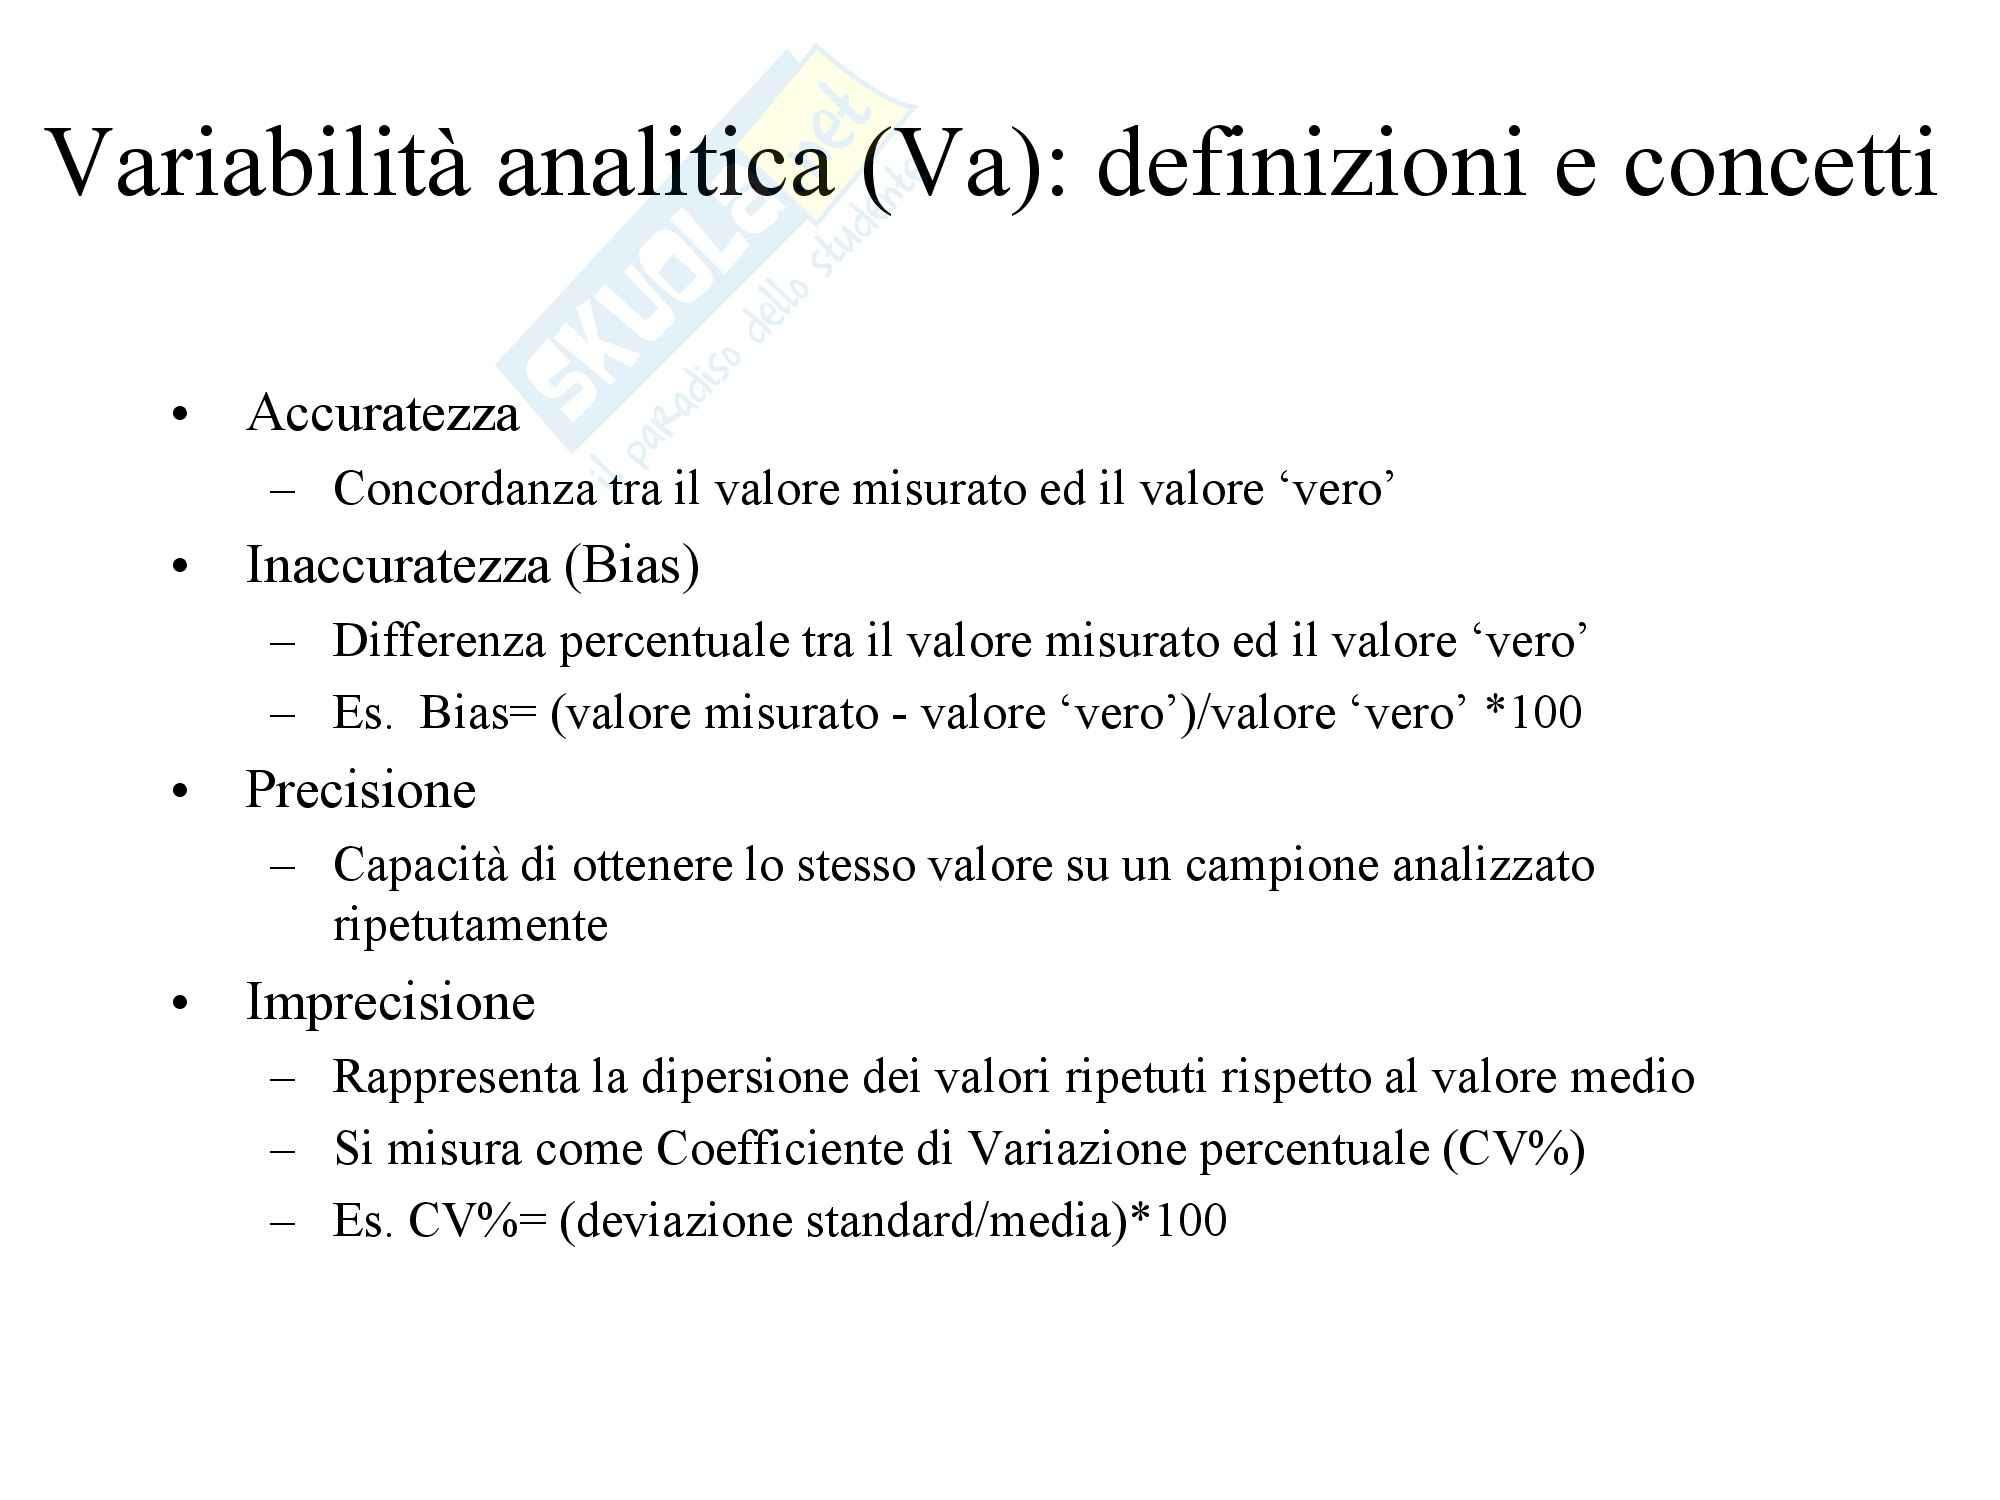 Biochimica Clinica e patologia clinica - Introduzione Pag. 6